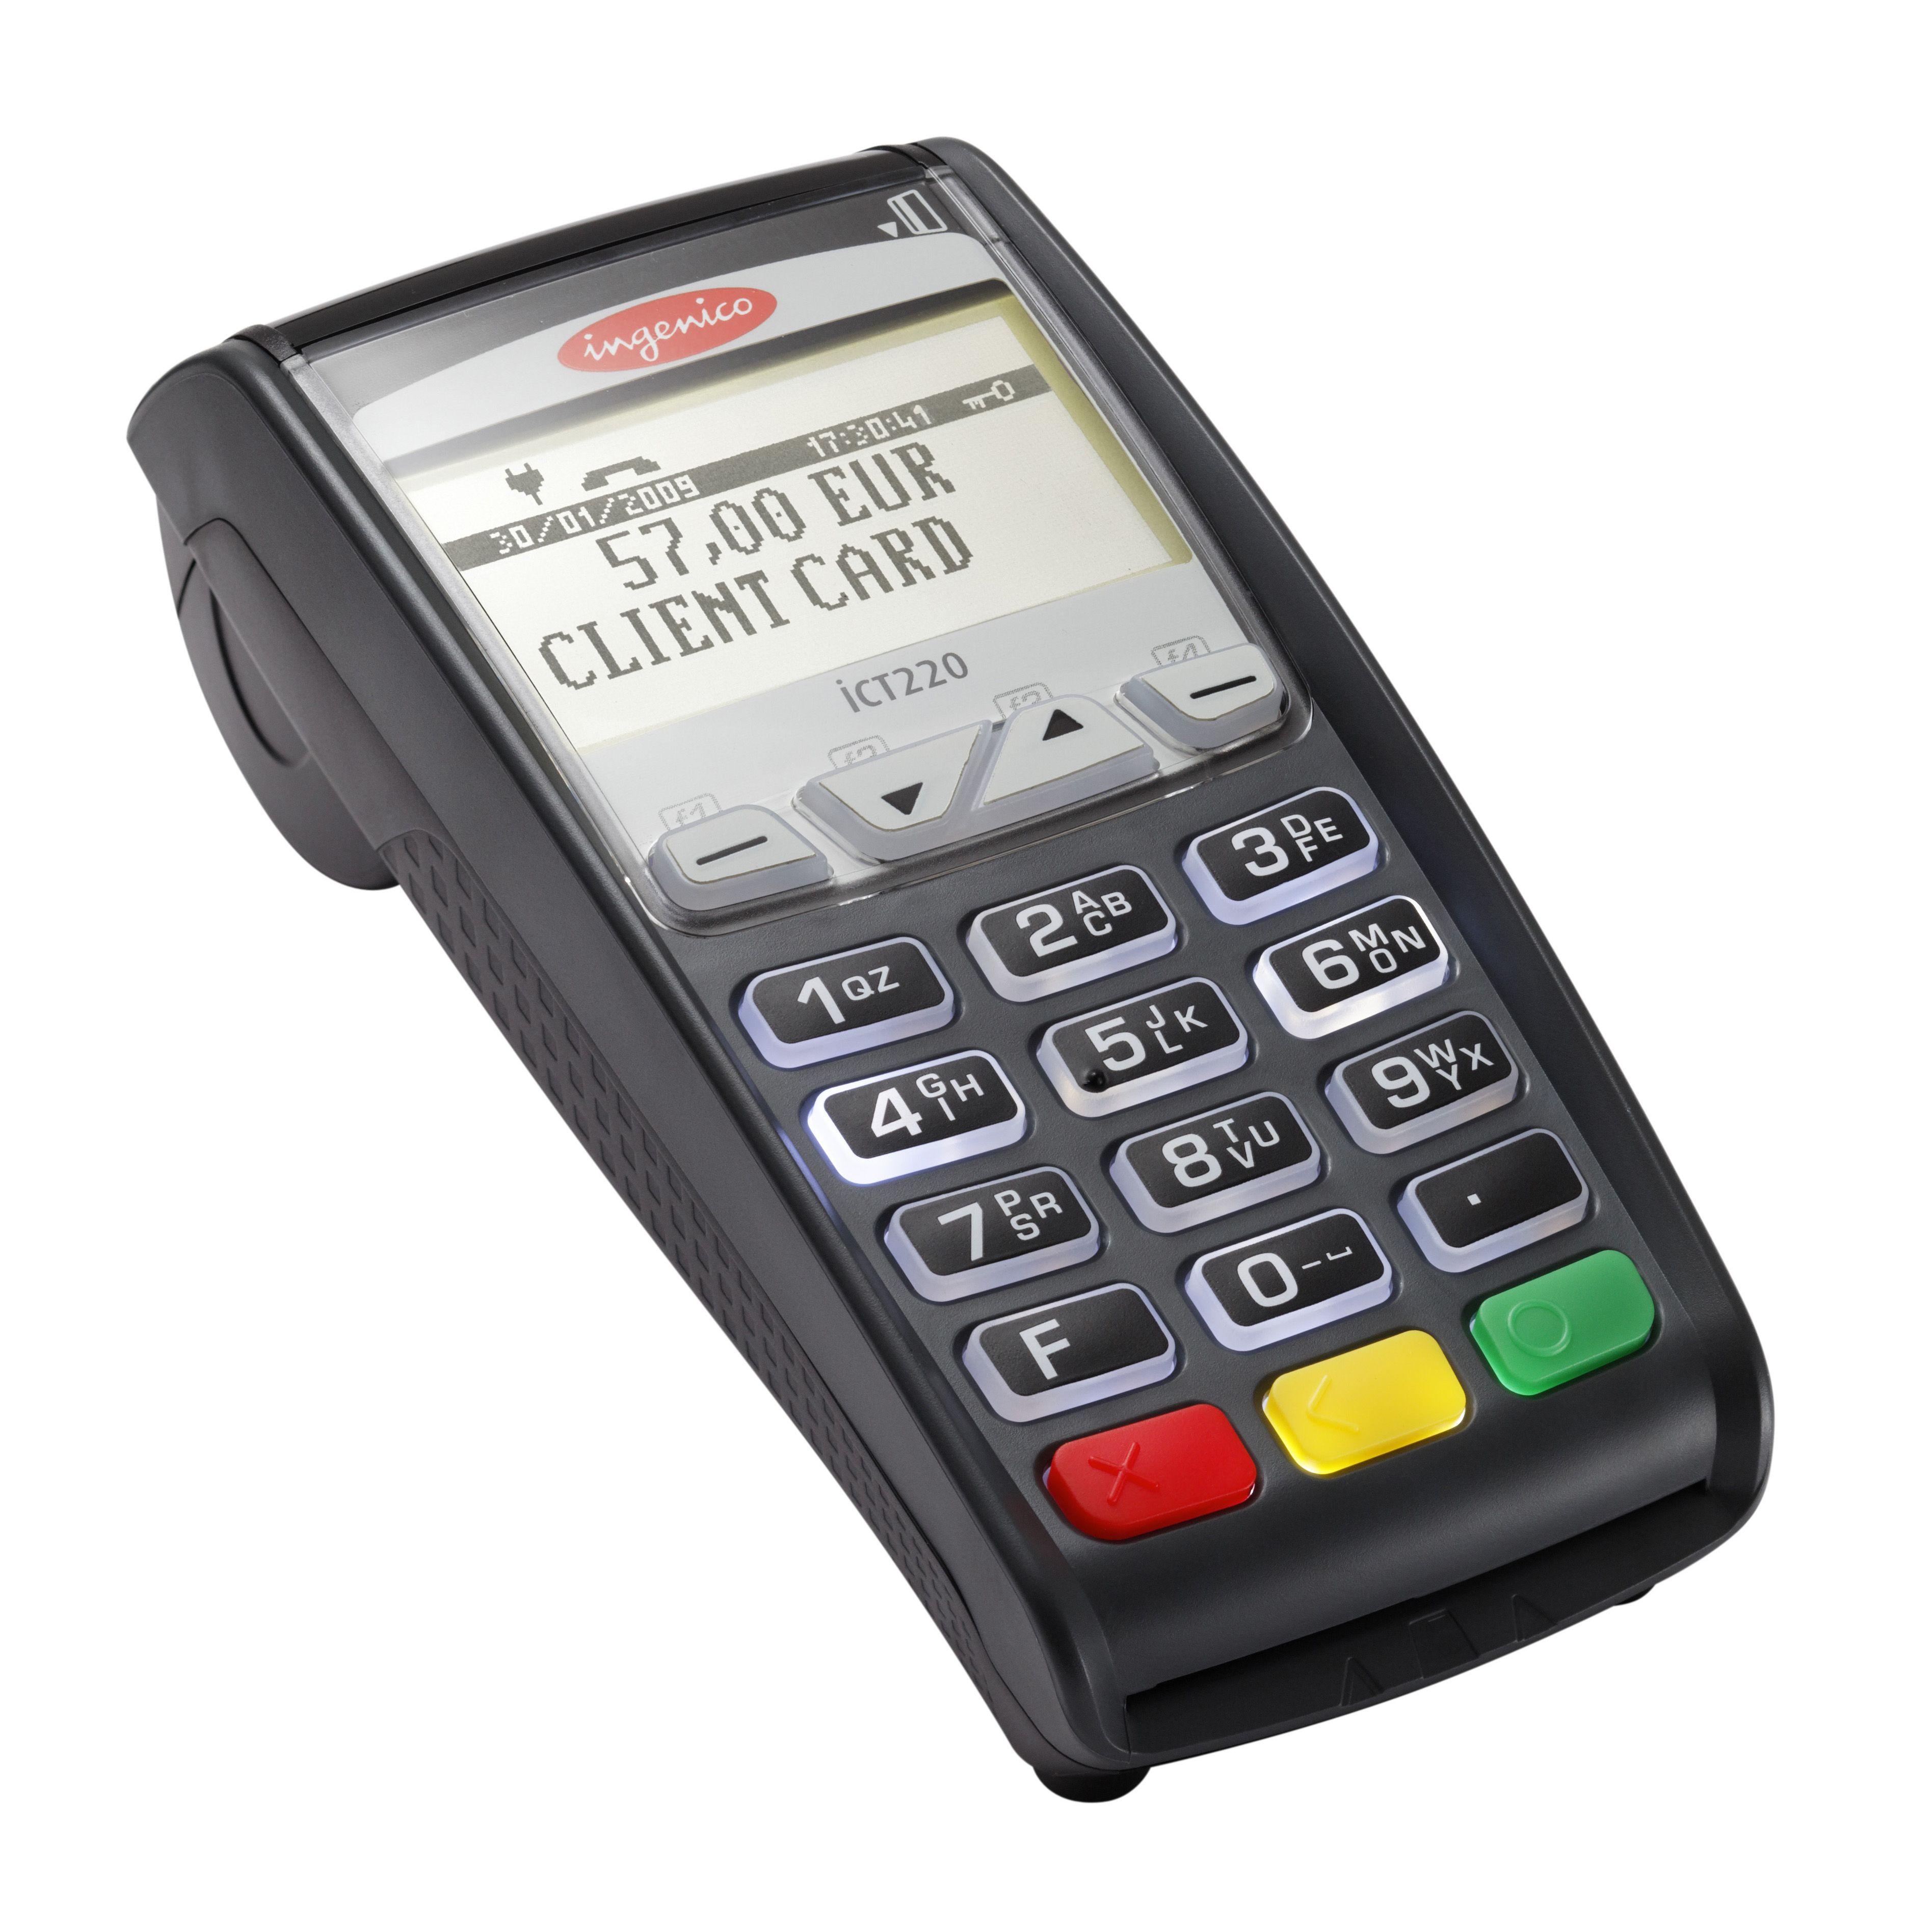 Ingenico ict series card reader